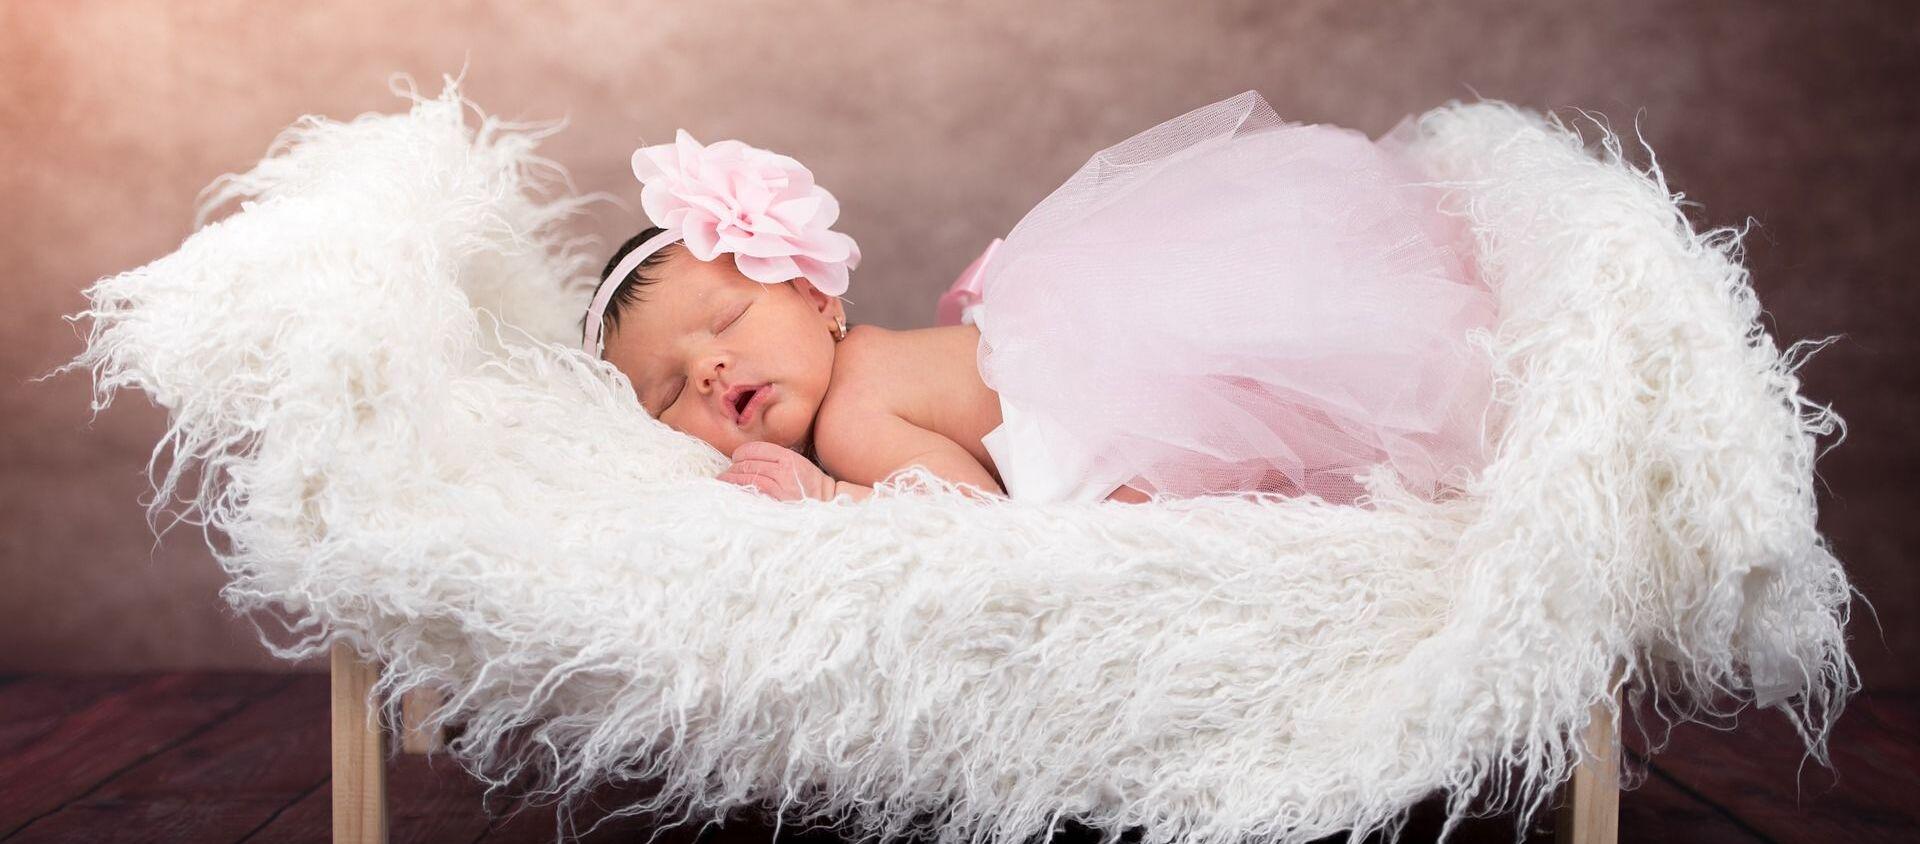 Una bebé recién nacida - Sputnik Mundo, 1920, 16.08.2019